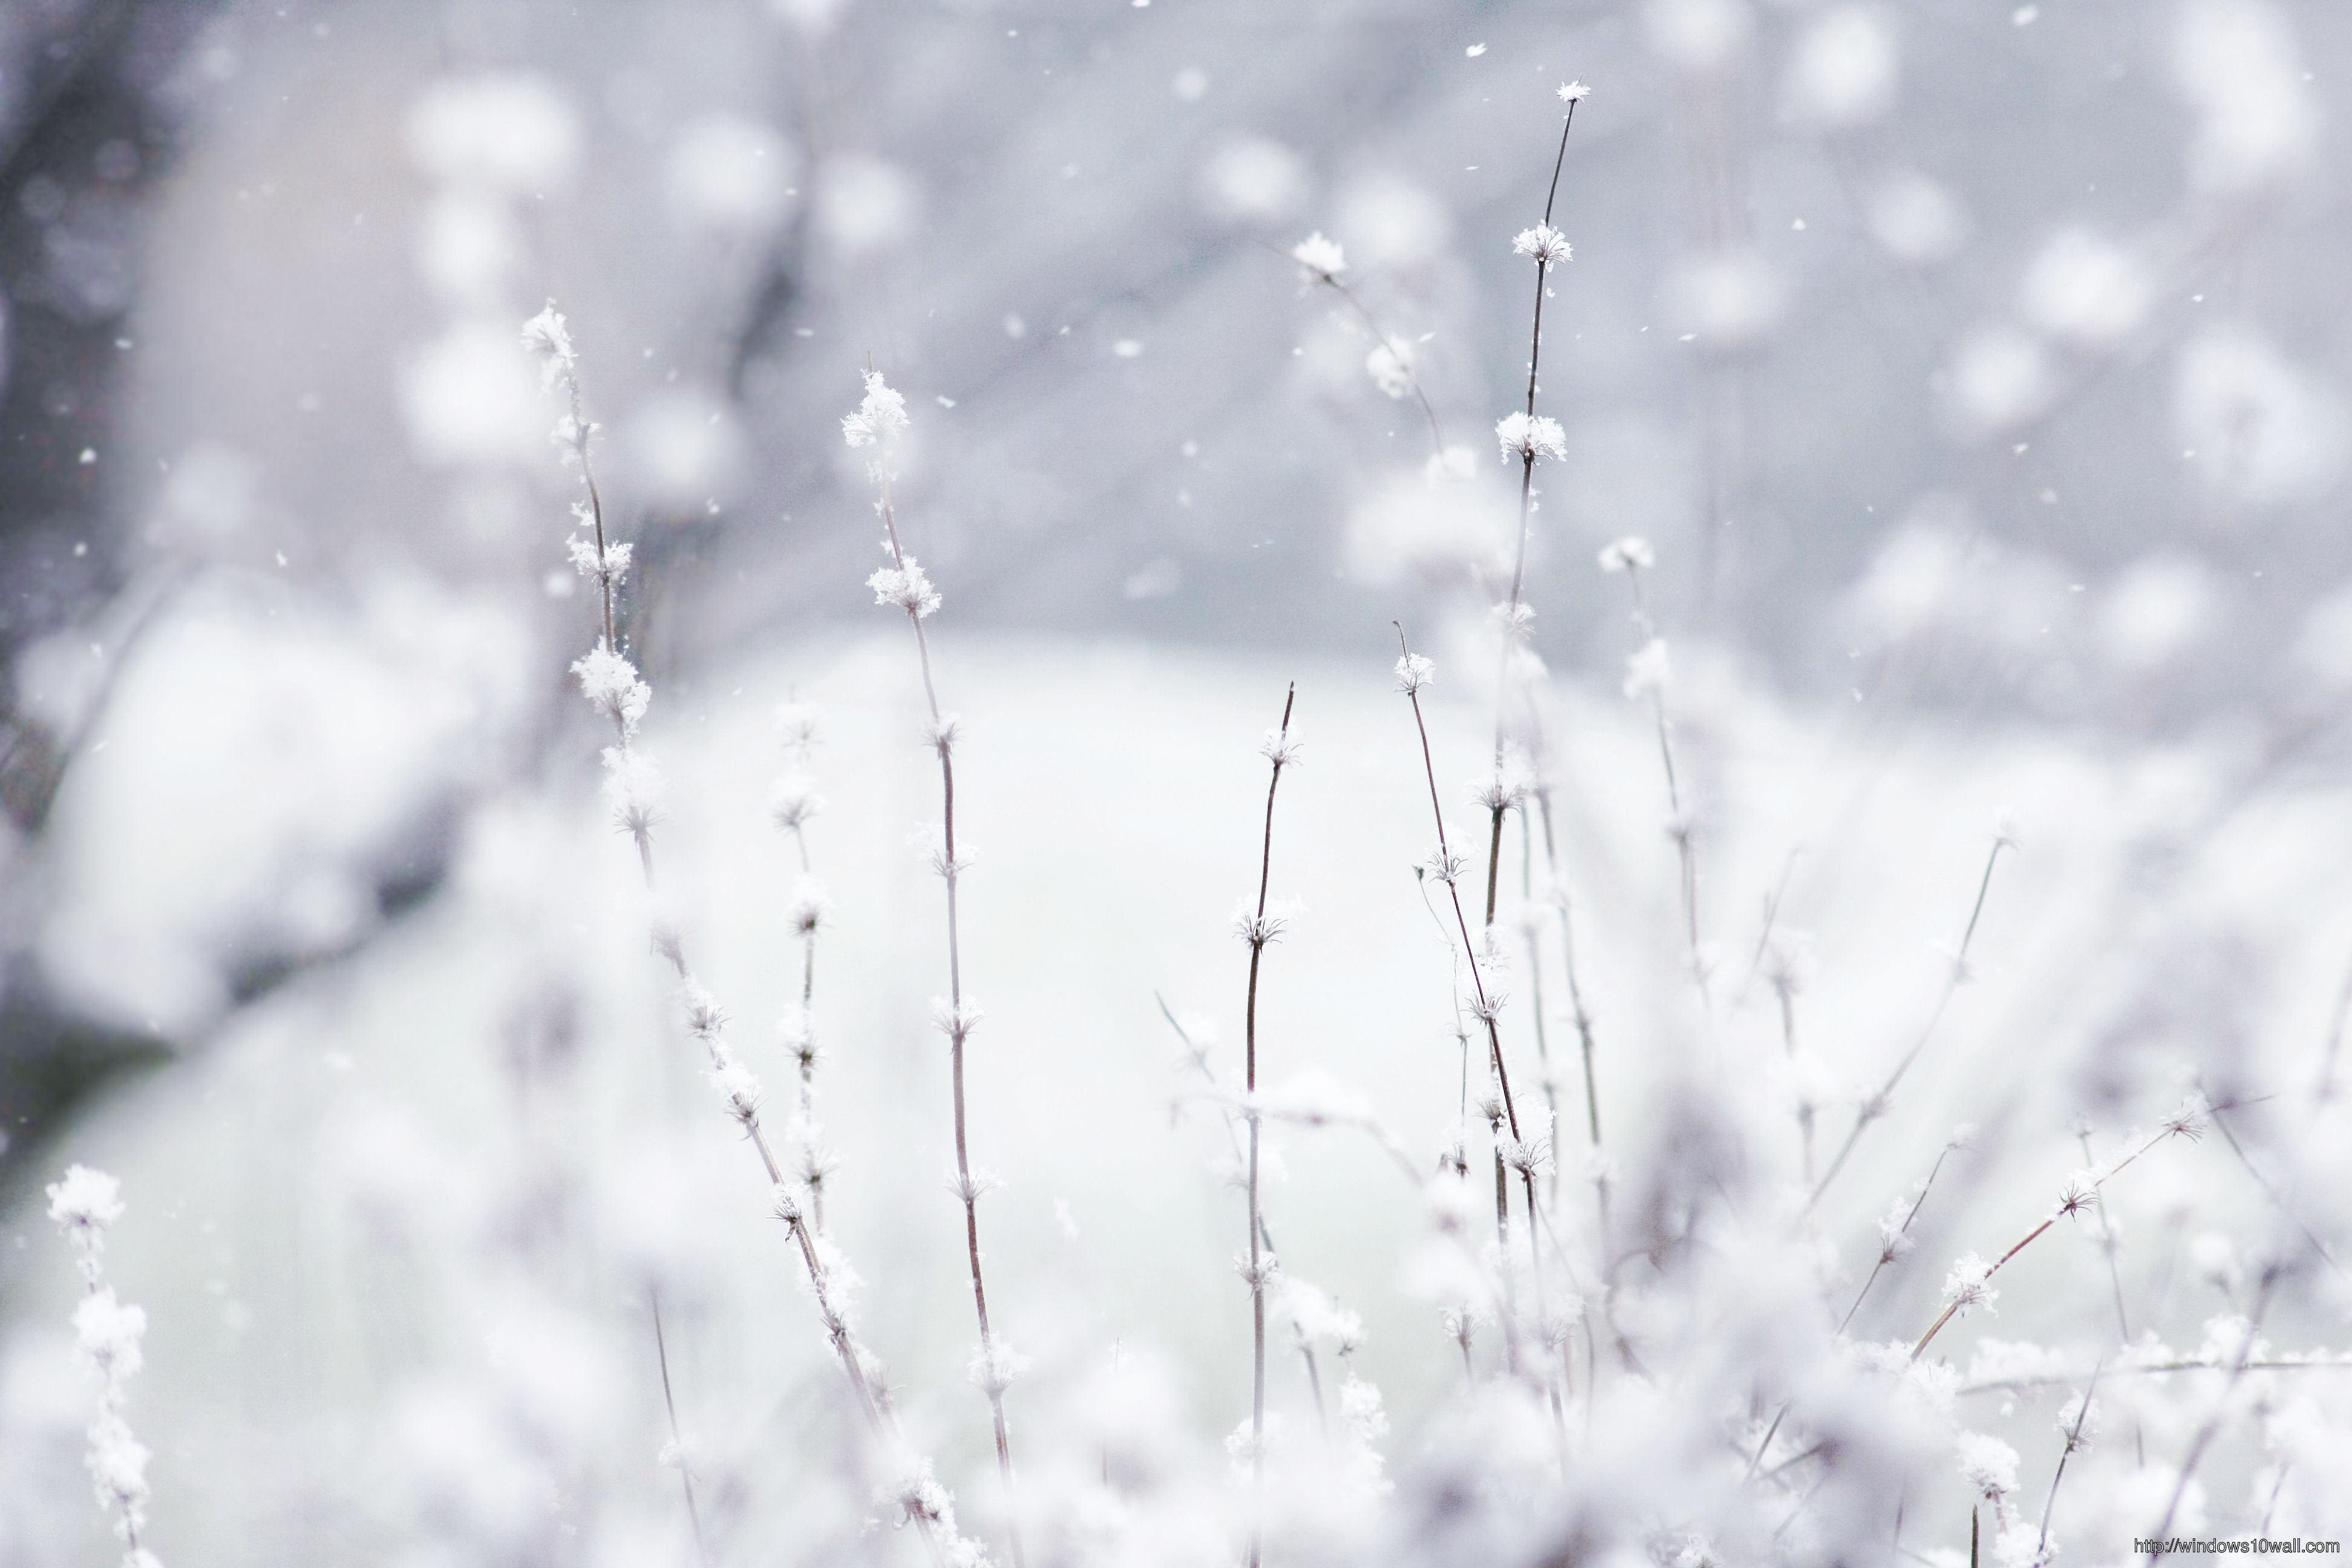 Desktop Backgrounds For Windows 10 Winter